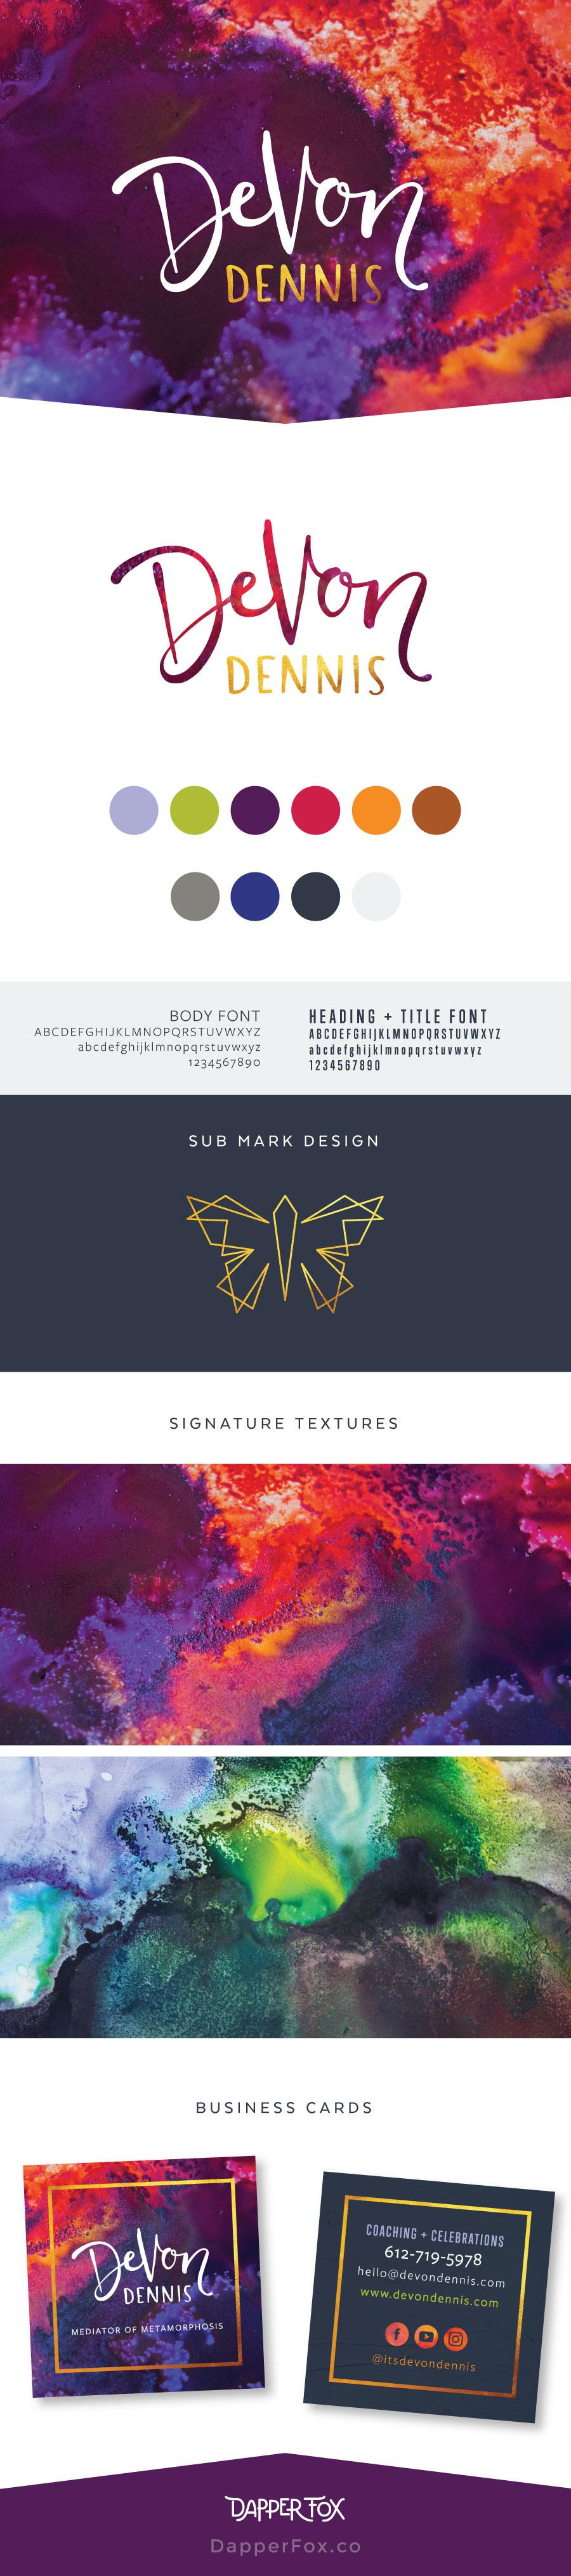 Brand Design for Devon Dennis Handwritten Script Logo Design Red Gold Purple Magical Coaching Logo #handwritten #logo #handlettering #scriptfont #handwrittenlogo #logodesign #magicallogo #coachinglogo